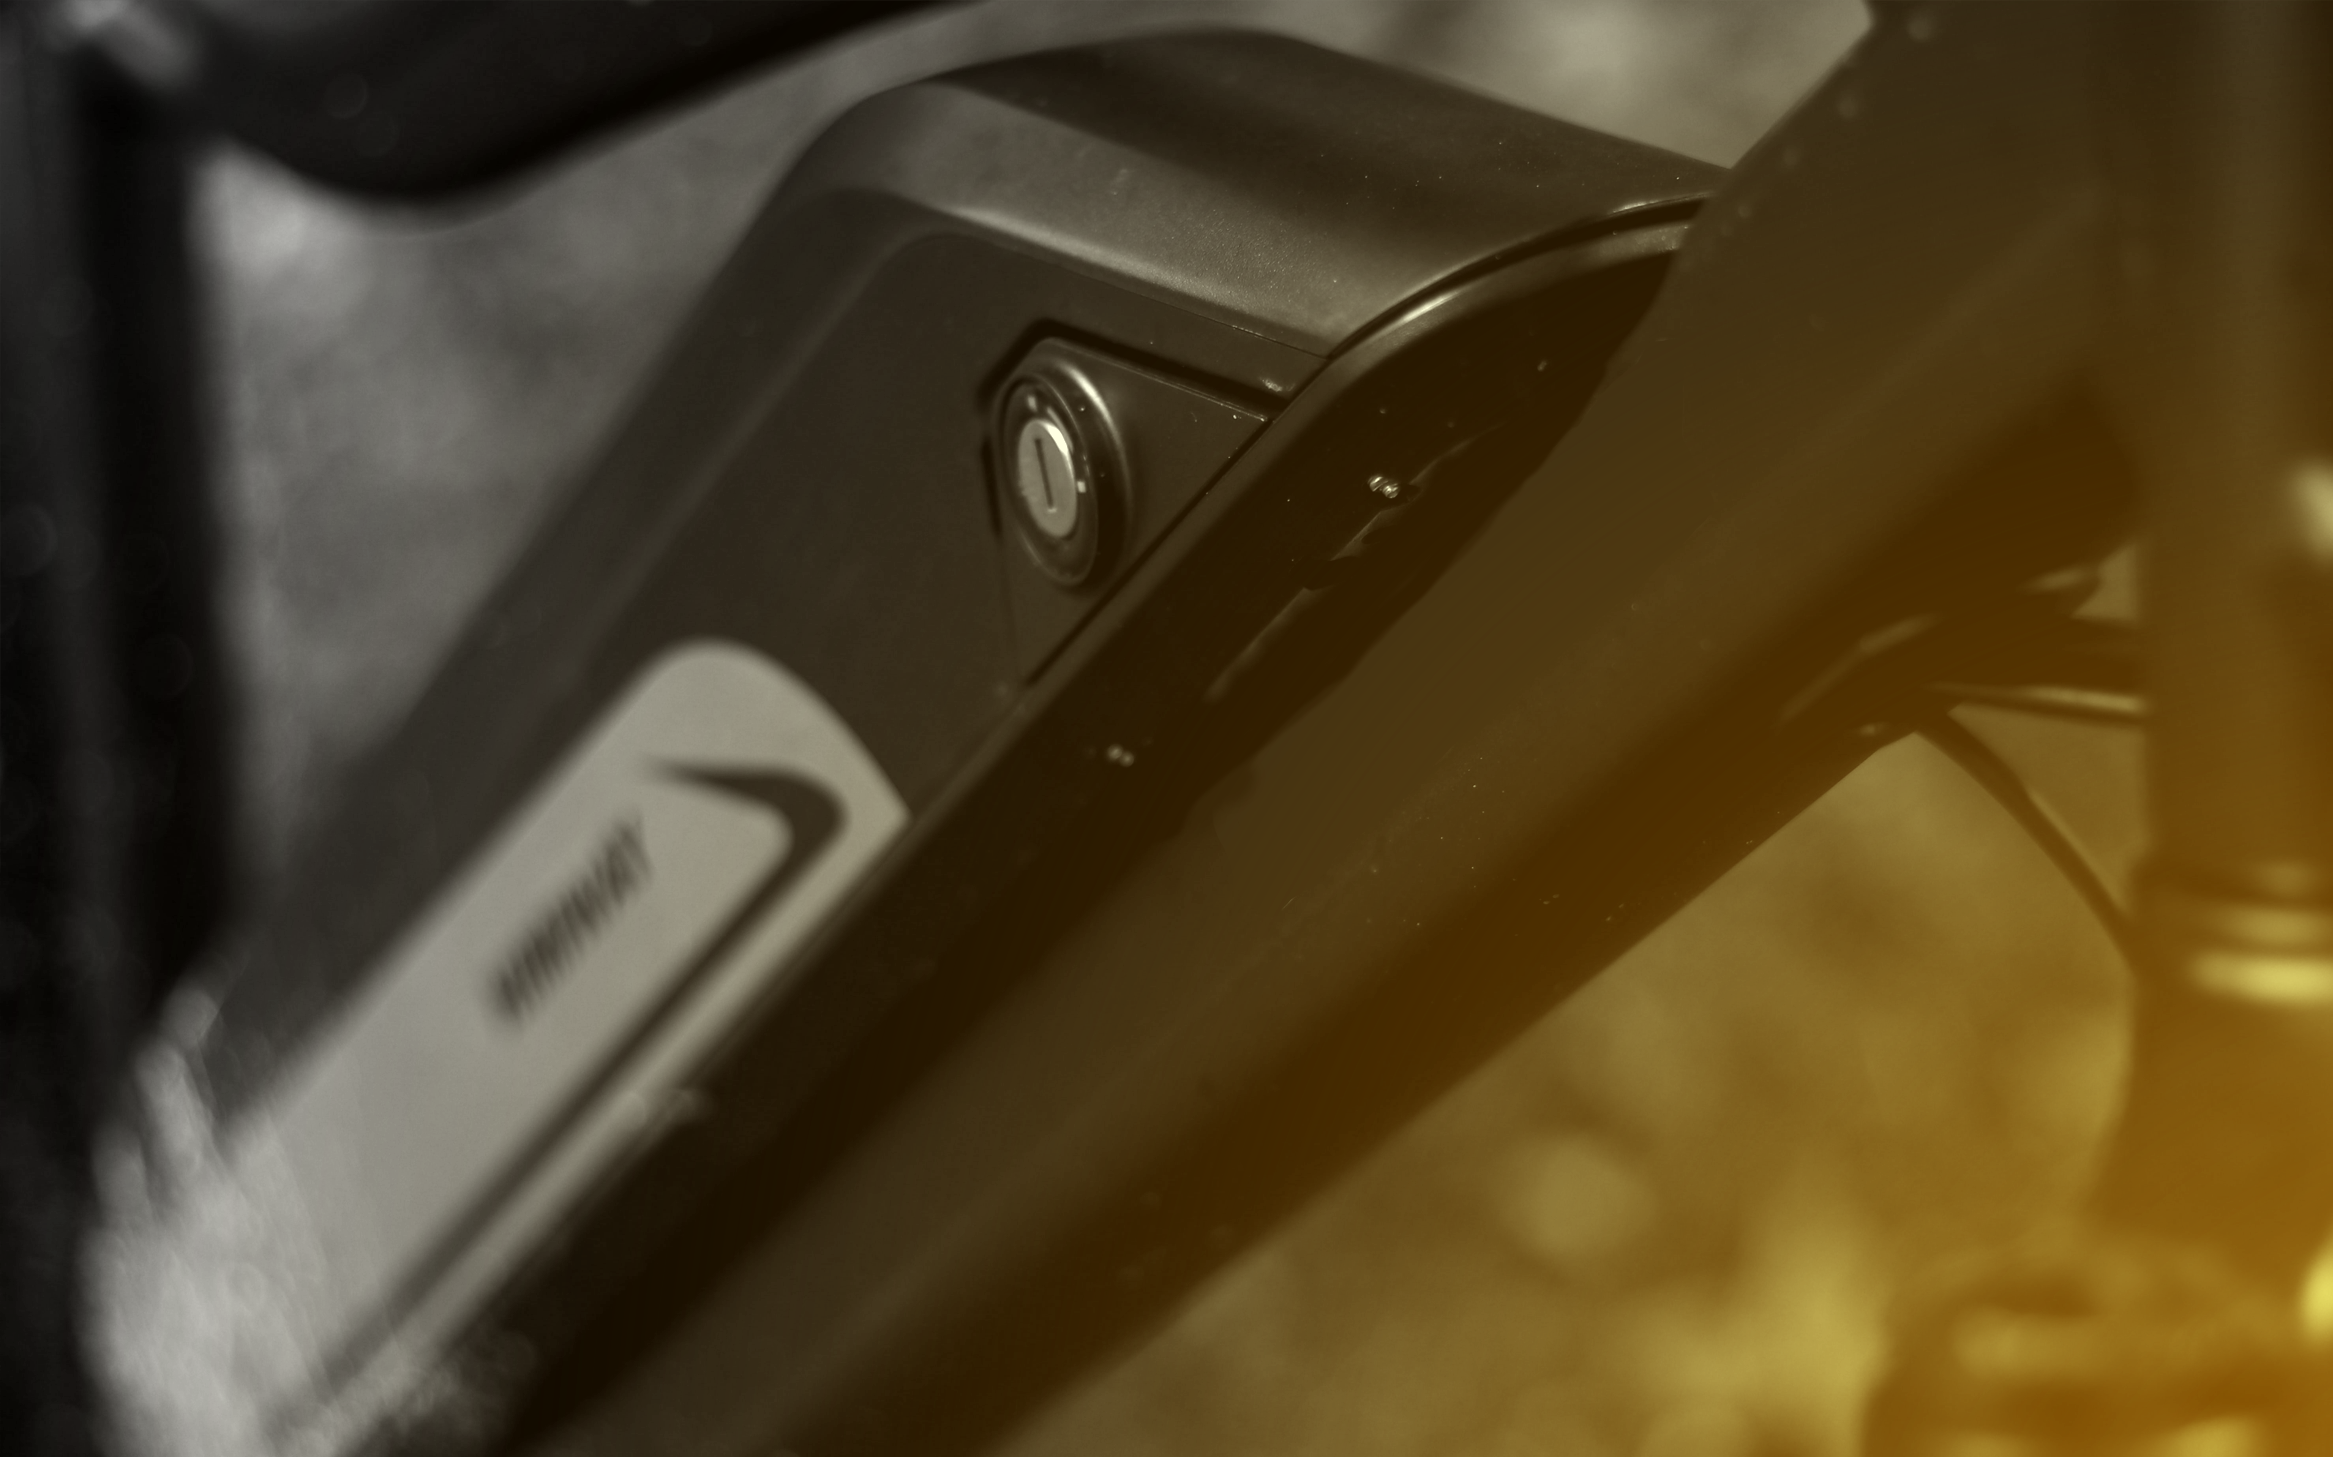 The battery of an e-bike